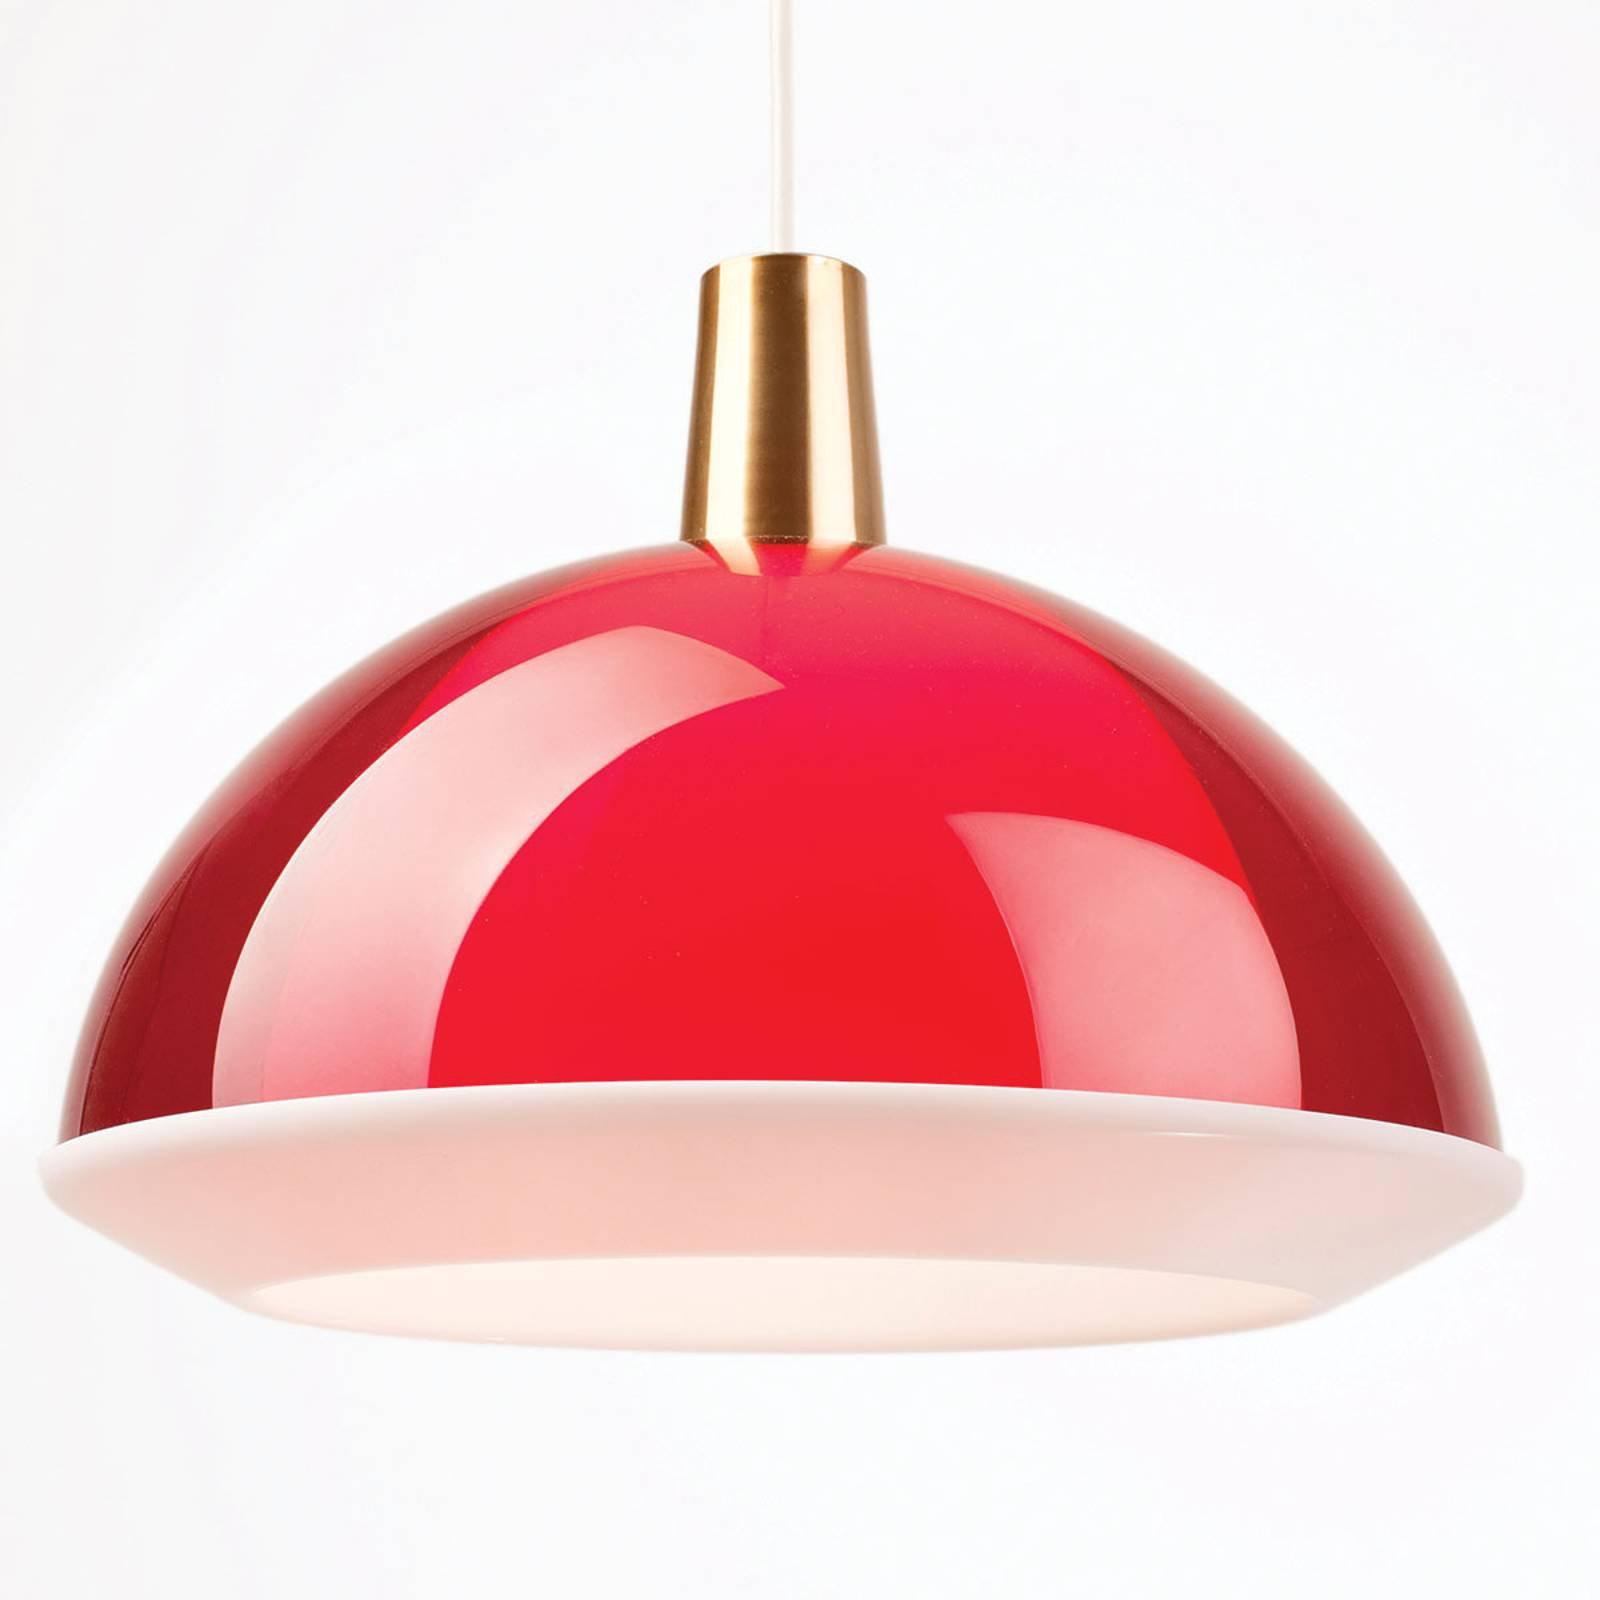 Innolux Kuplat 400 pendellampe, 40 cm, rød